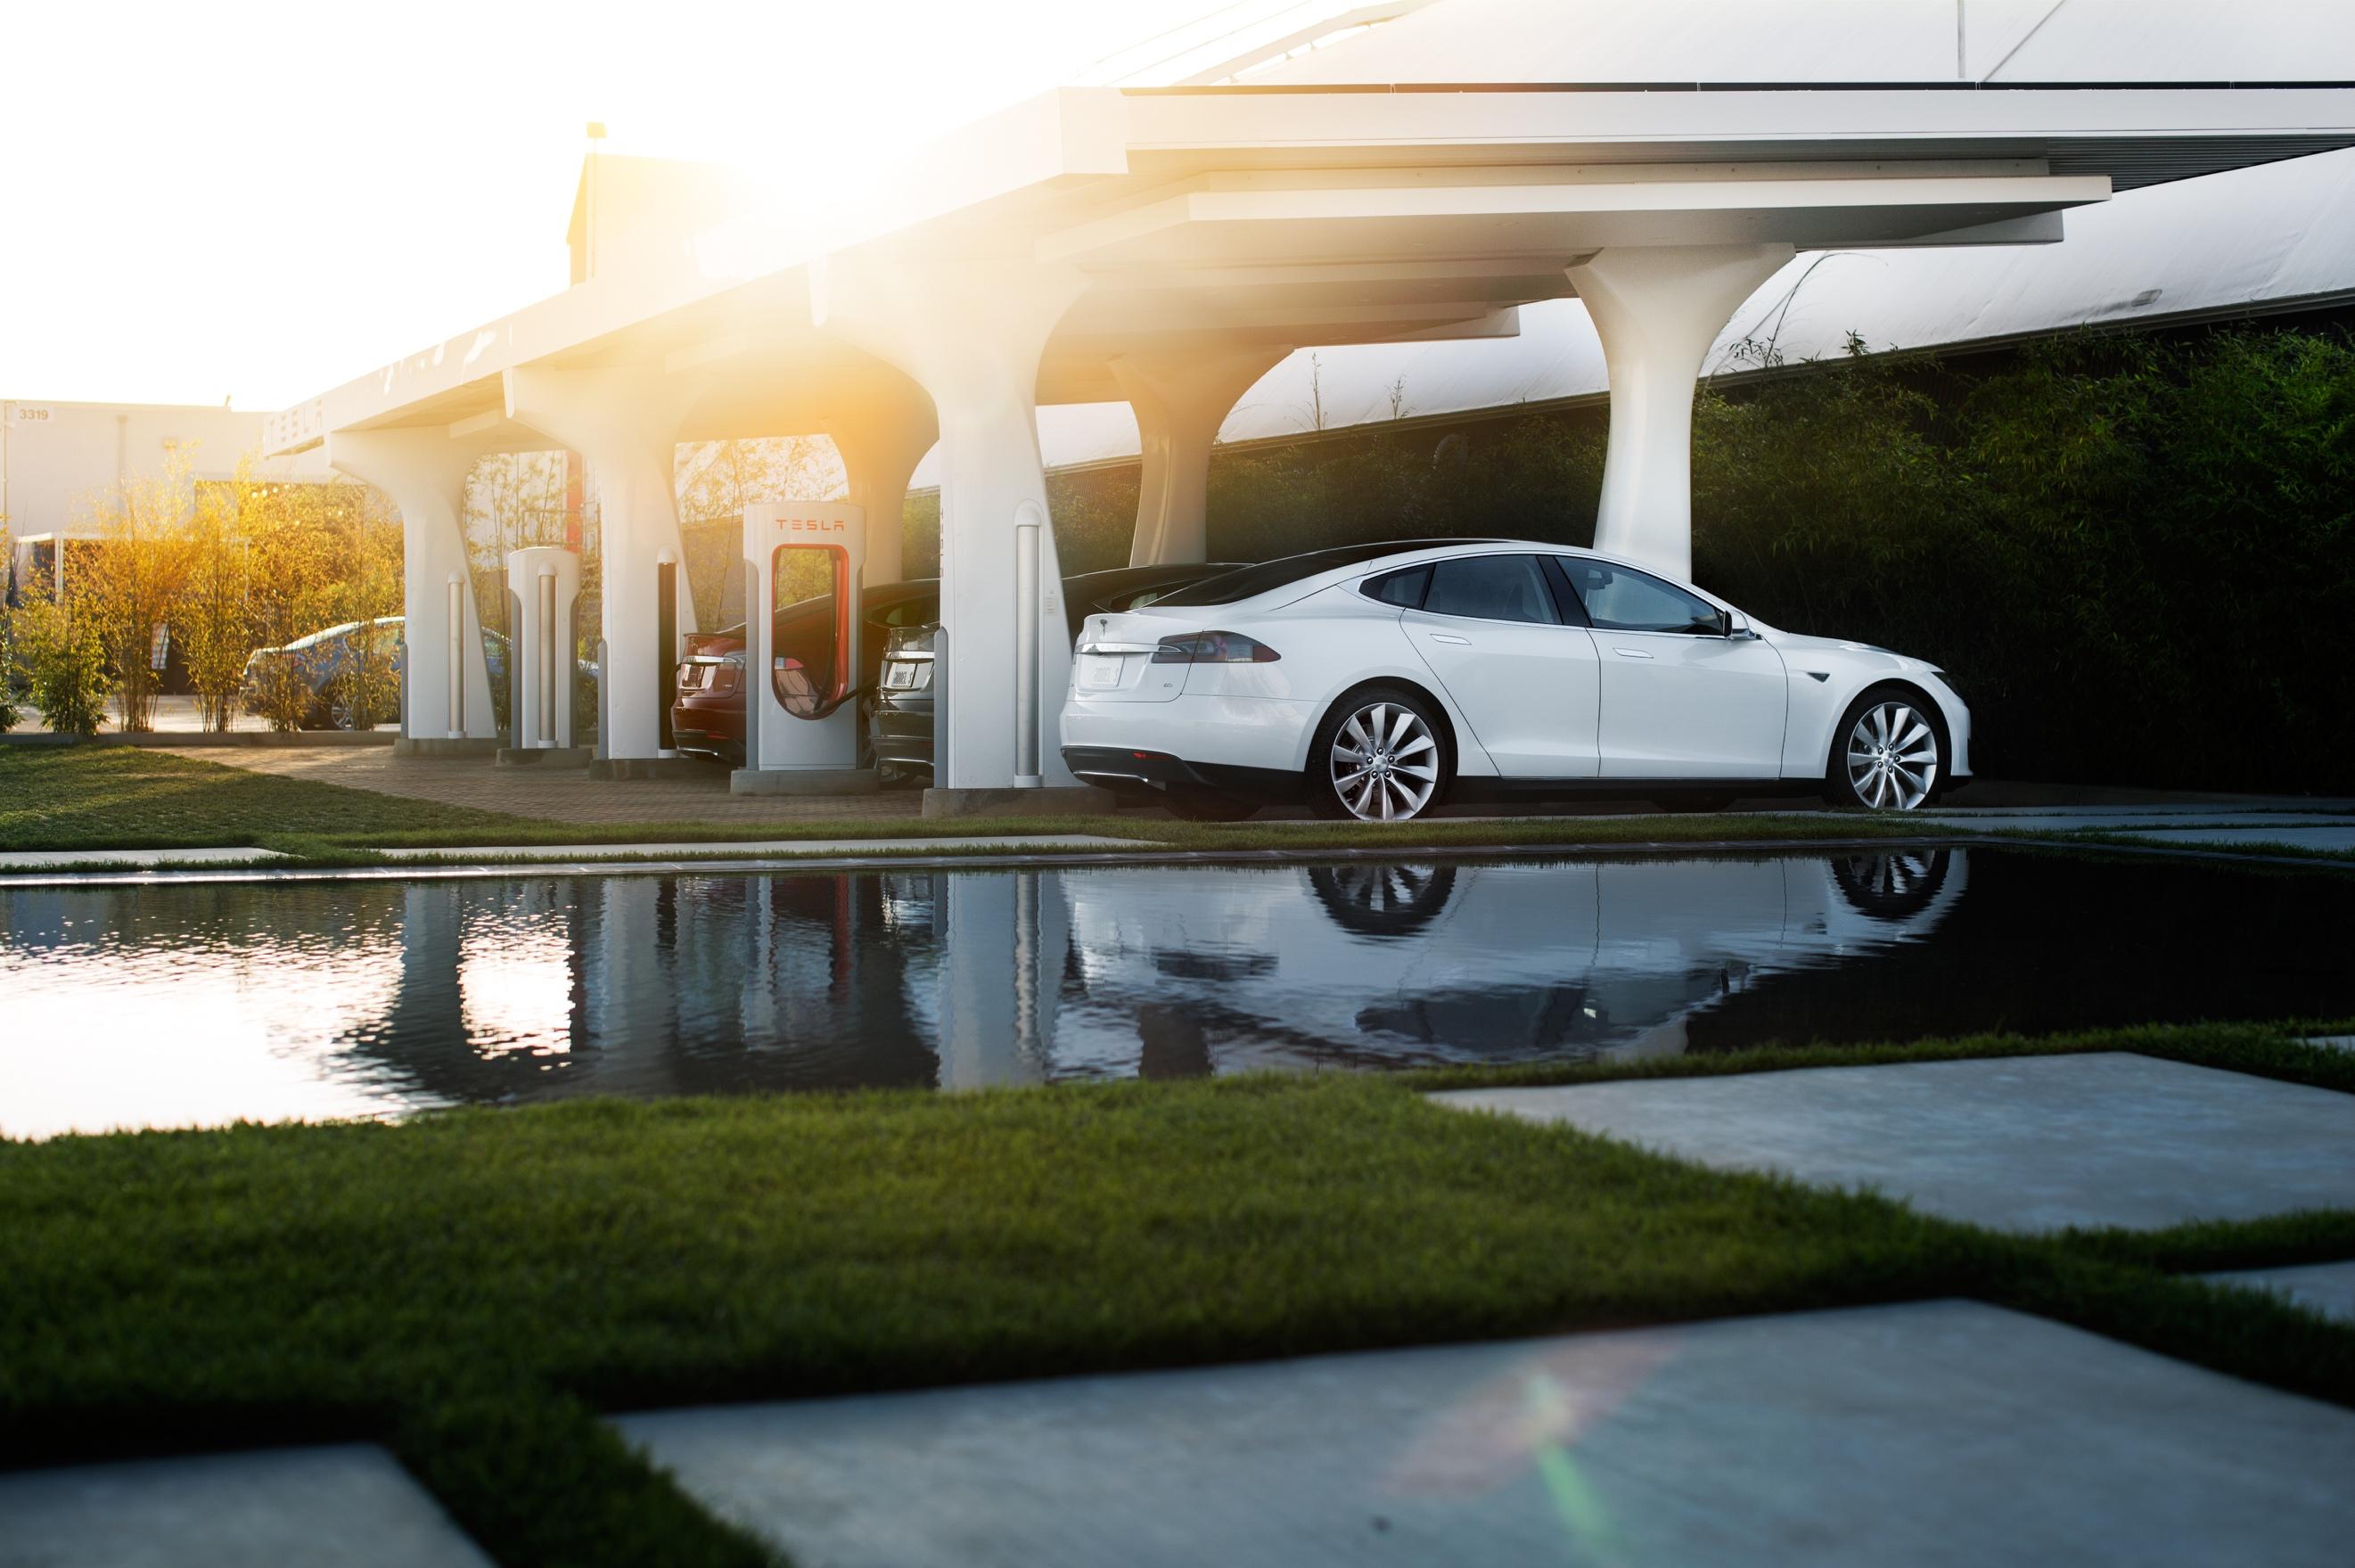 ../Press%20Kits/Tesla_ChargingAndSuperchargeNetwork/LIN_6586.jpg